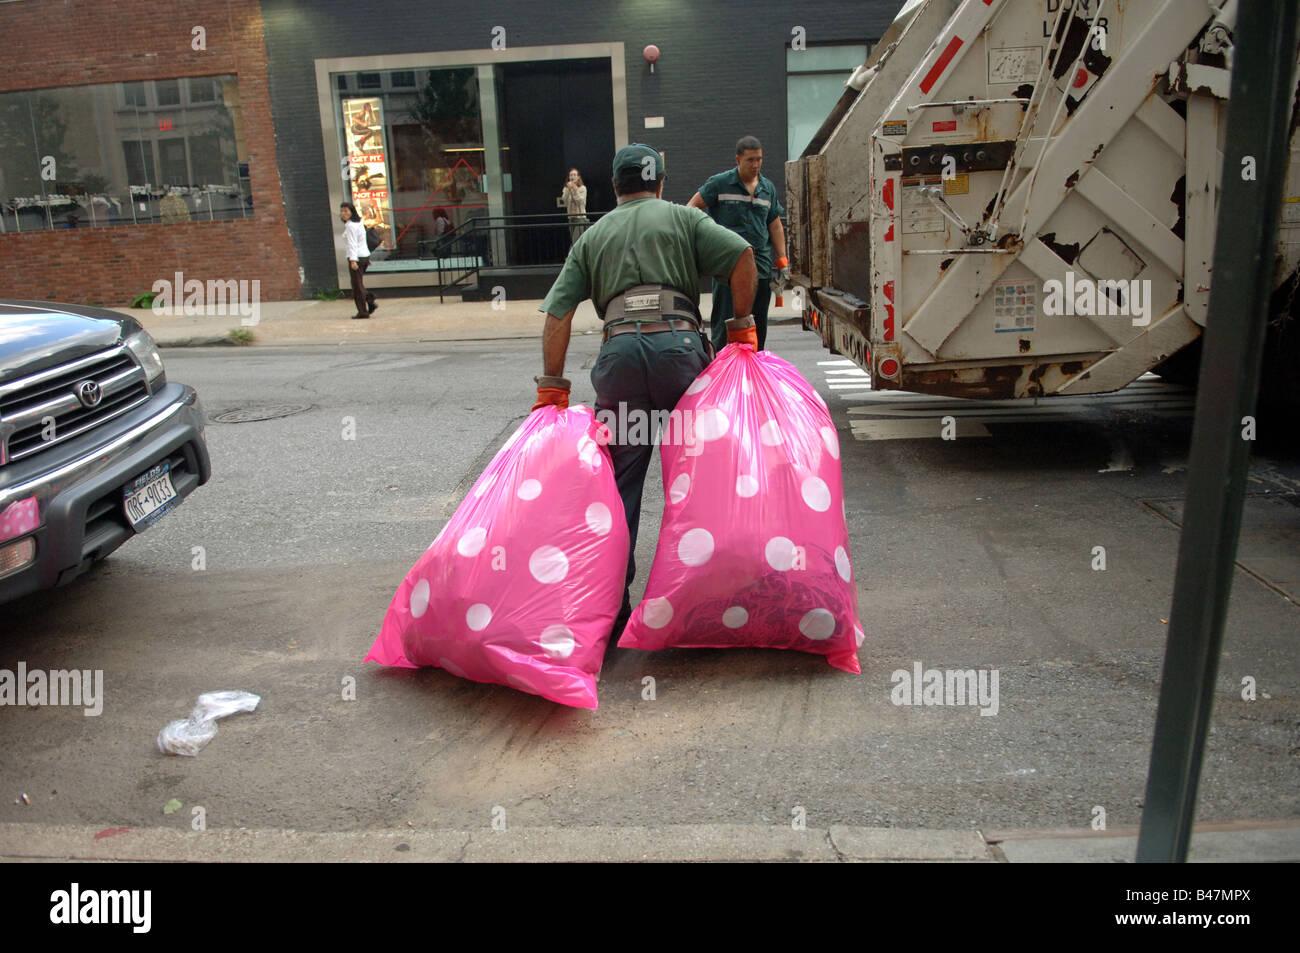 Bunte Pink Polka Dot Kunststoff Müllbeutel Sind Im Meatpacking District In New York Gesammelt Stockfotografie Alamy